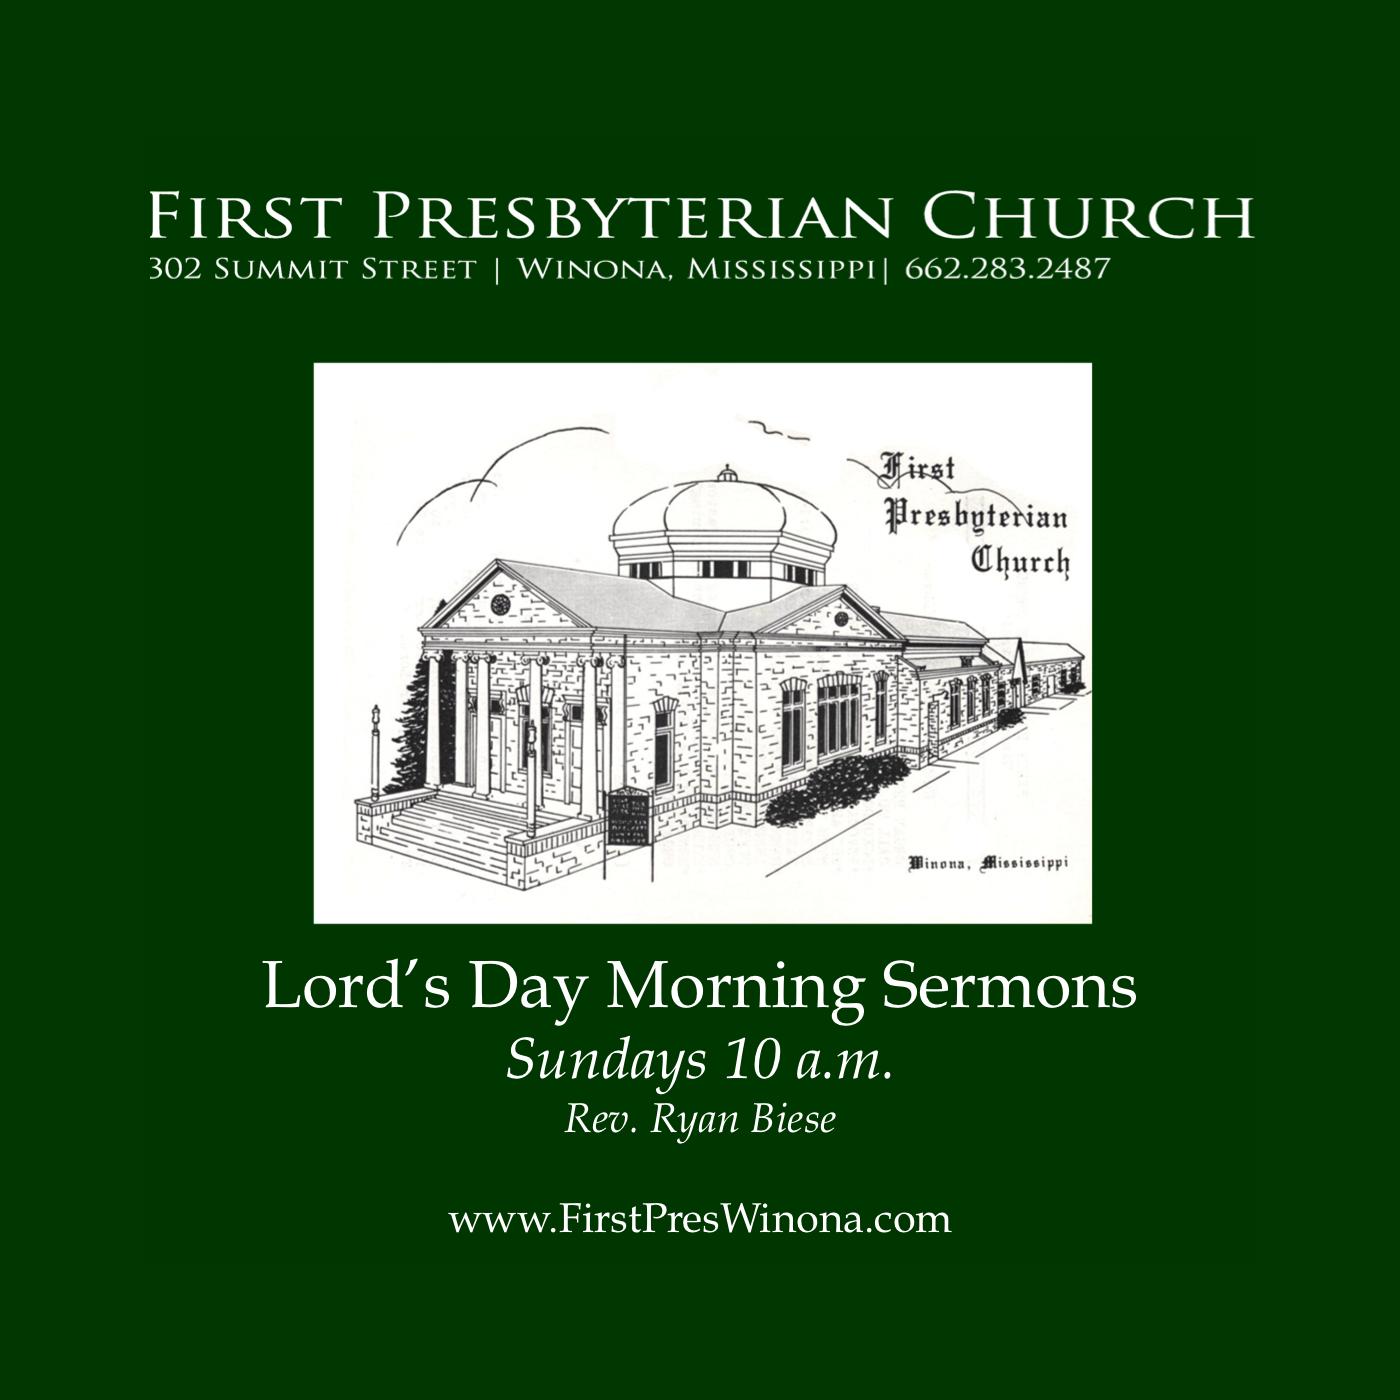 First Presbyterian Church - Sermons